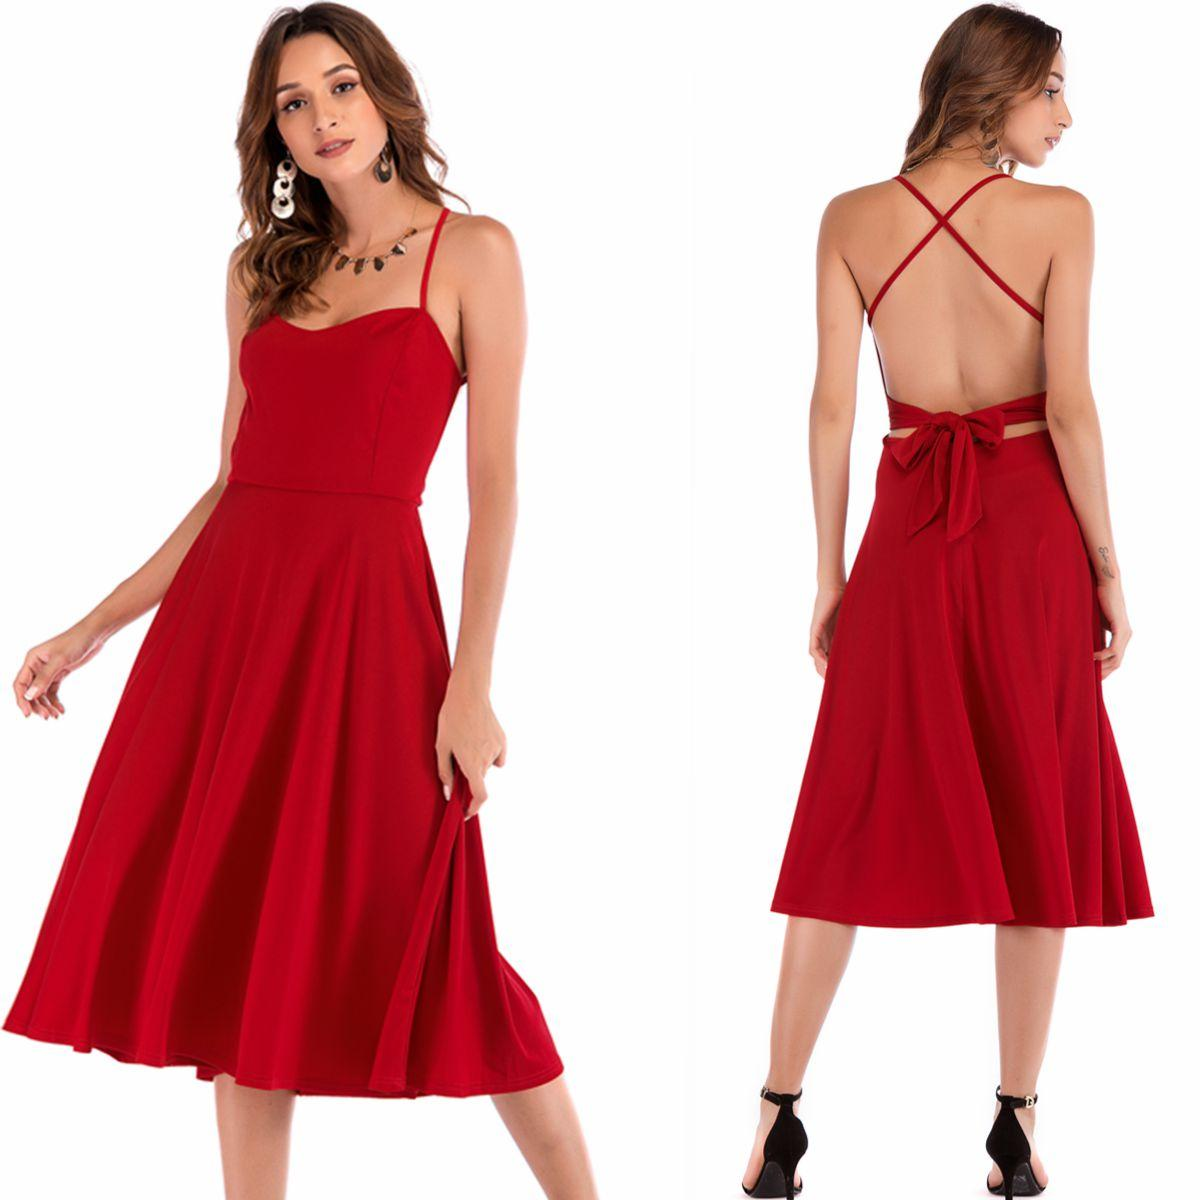 official photos 23c29 bc2ac Abendkleider für Frauen Spaghetti Strap Midi Solid Red Sexy Backless Sommer  Party Dinner Cocktail Prom Kleider 8965